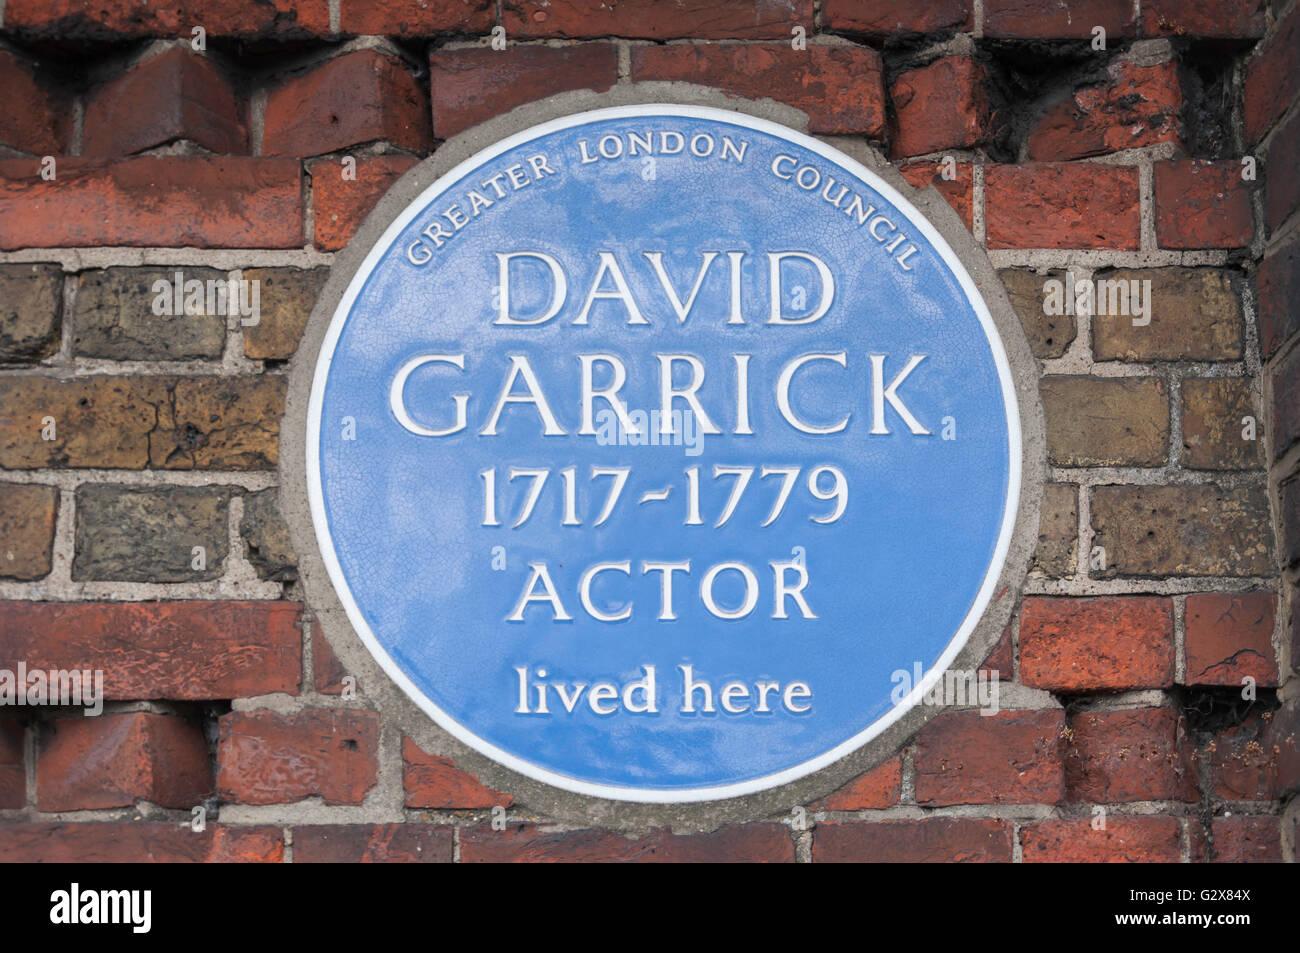 Placa azul del siglo XVIII el actor David Garrick, Garrick House, Hampton, Greater London, England, Reino Unido Imagen De Stock